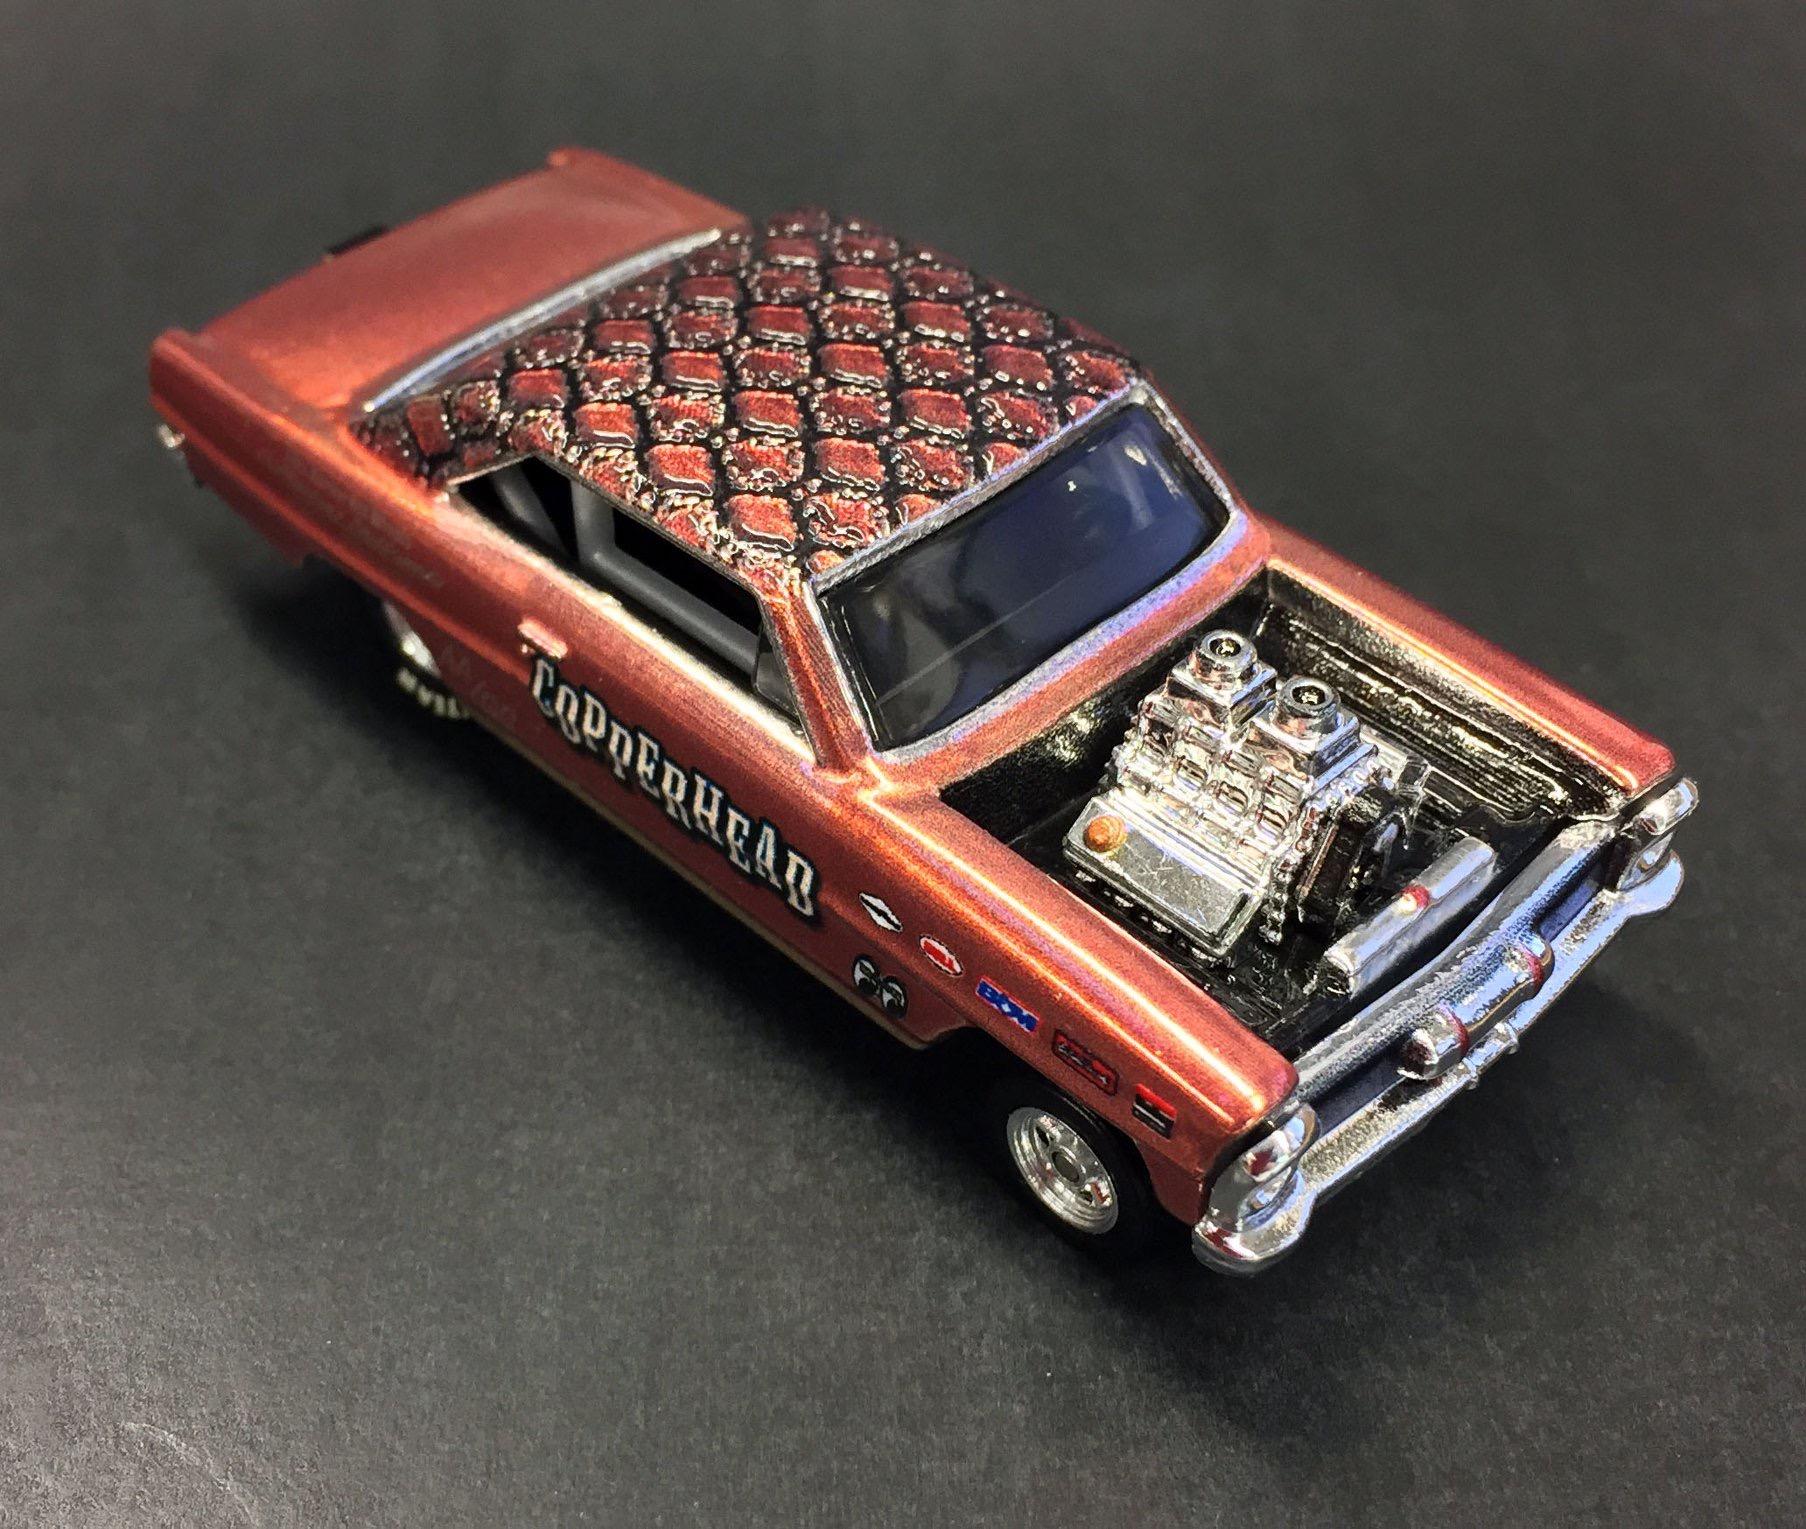 You gotta check out the Hot Wheels '66 Super Nova Gasser